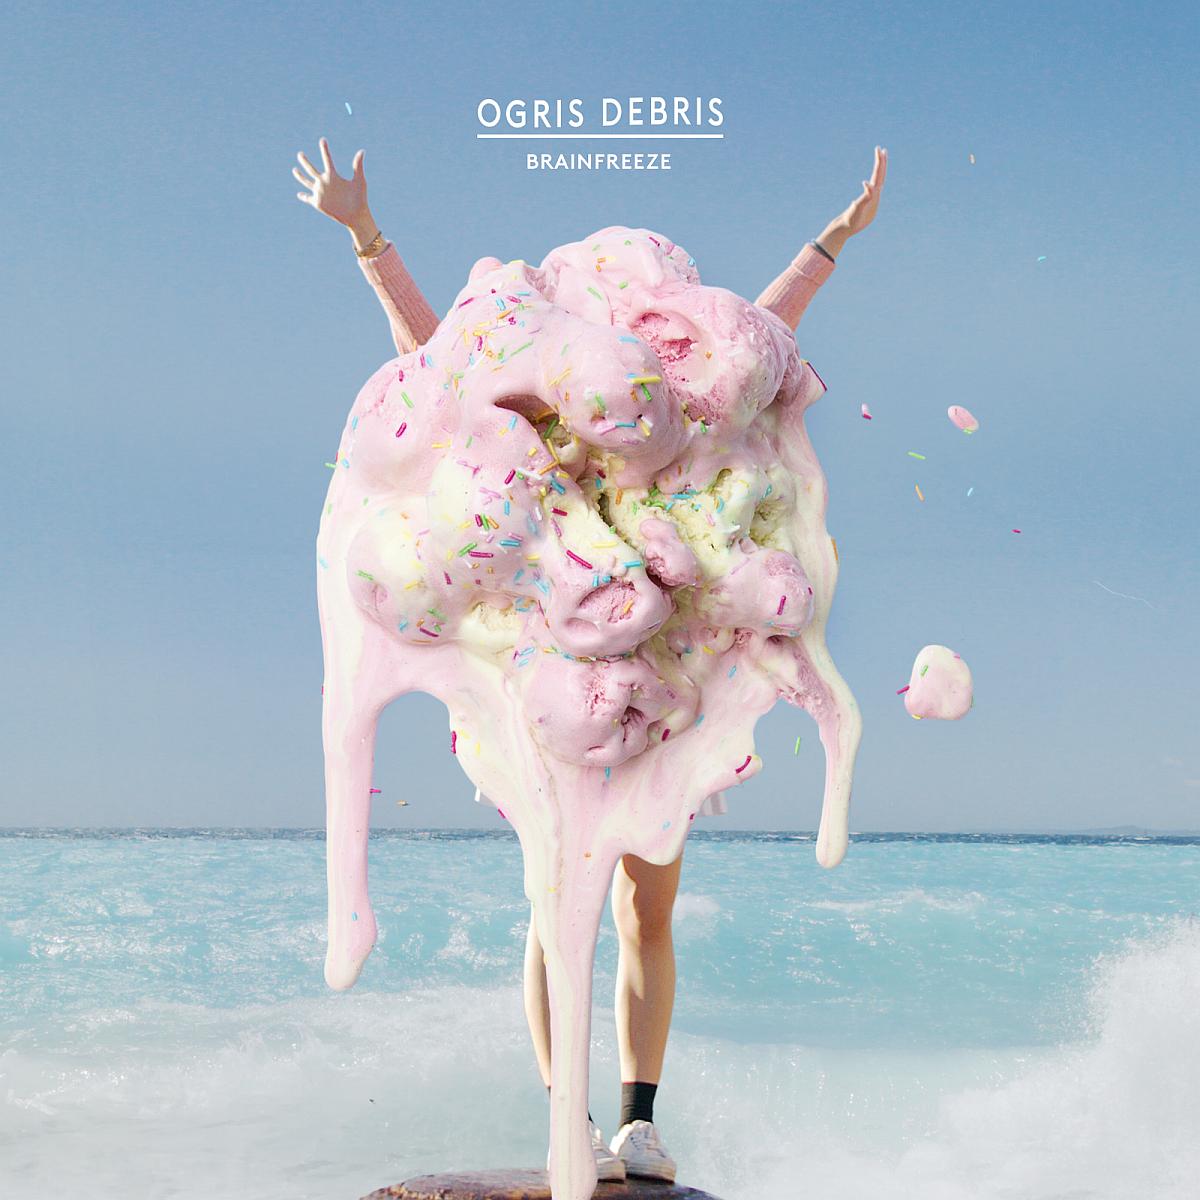 Cover_Ogris_Debris_Brainfreeze_DIGAFF_006